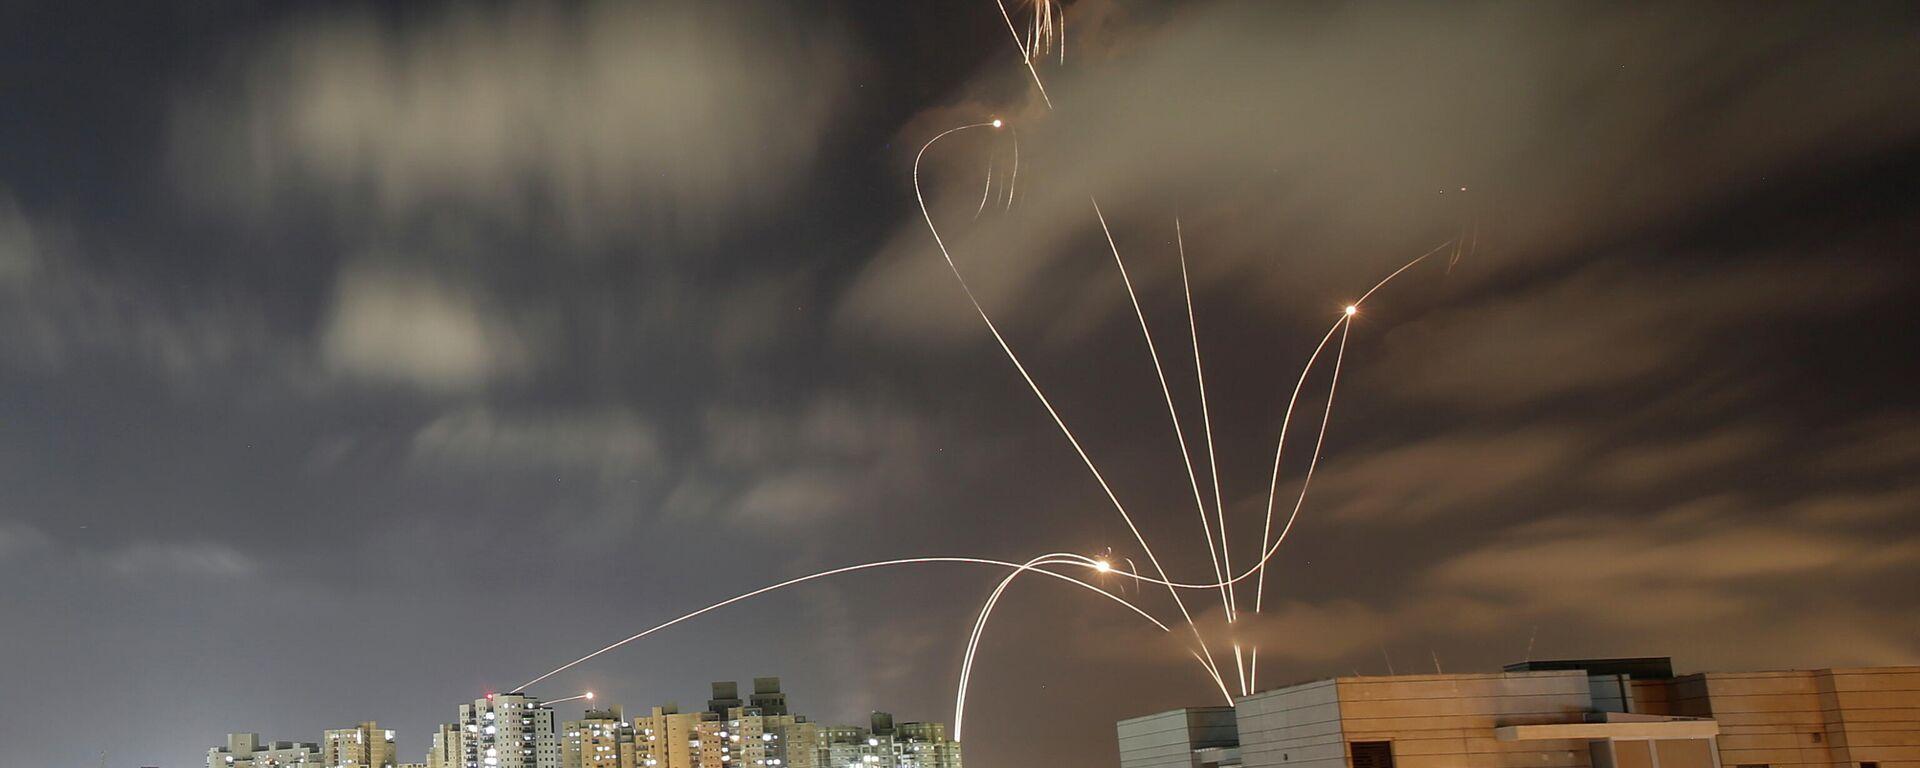 La Cúpula de Hierro israelí intercepta misiles lanzados desde Gaza - Sputnik Mundo, 1920, 28.05.2021